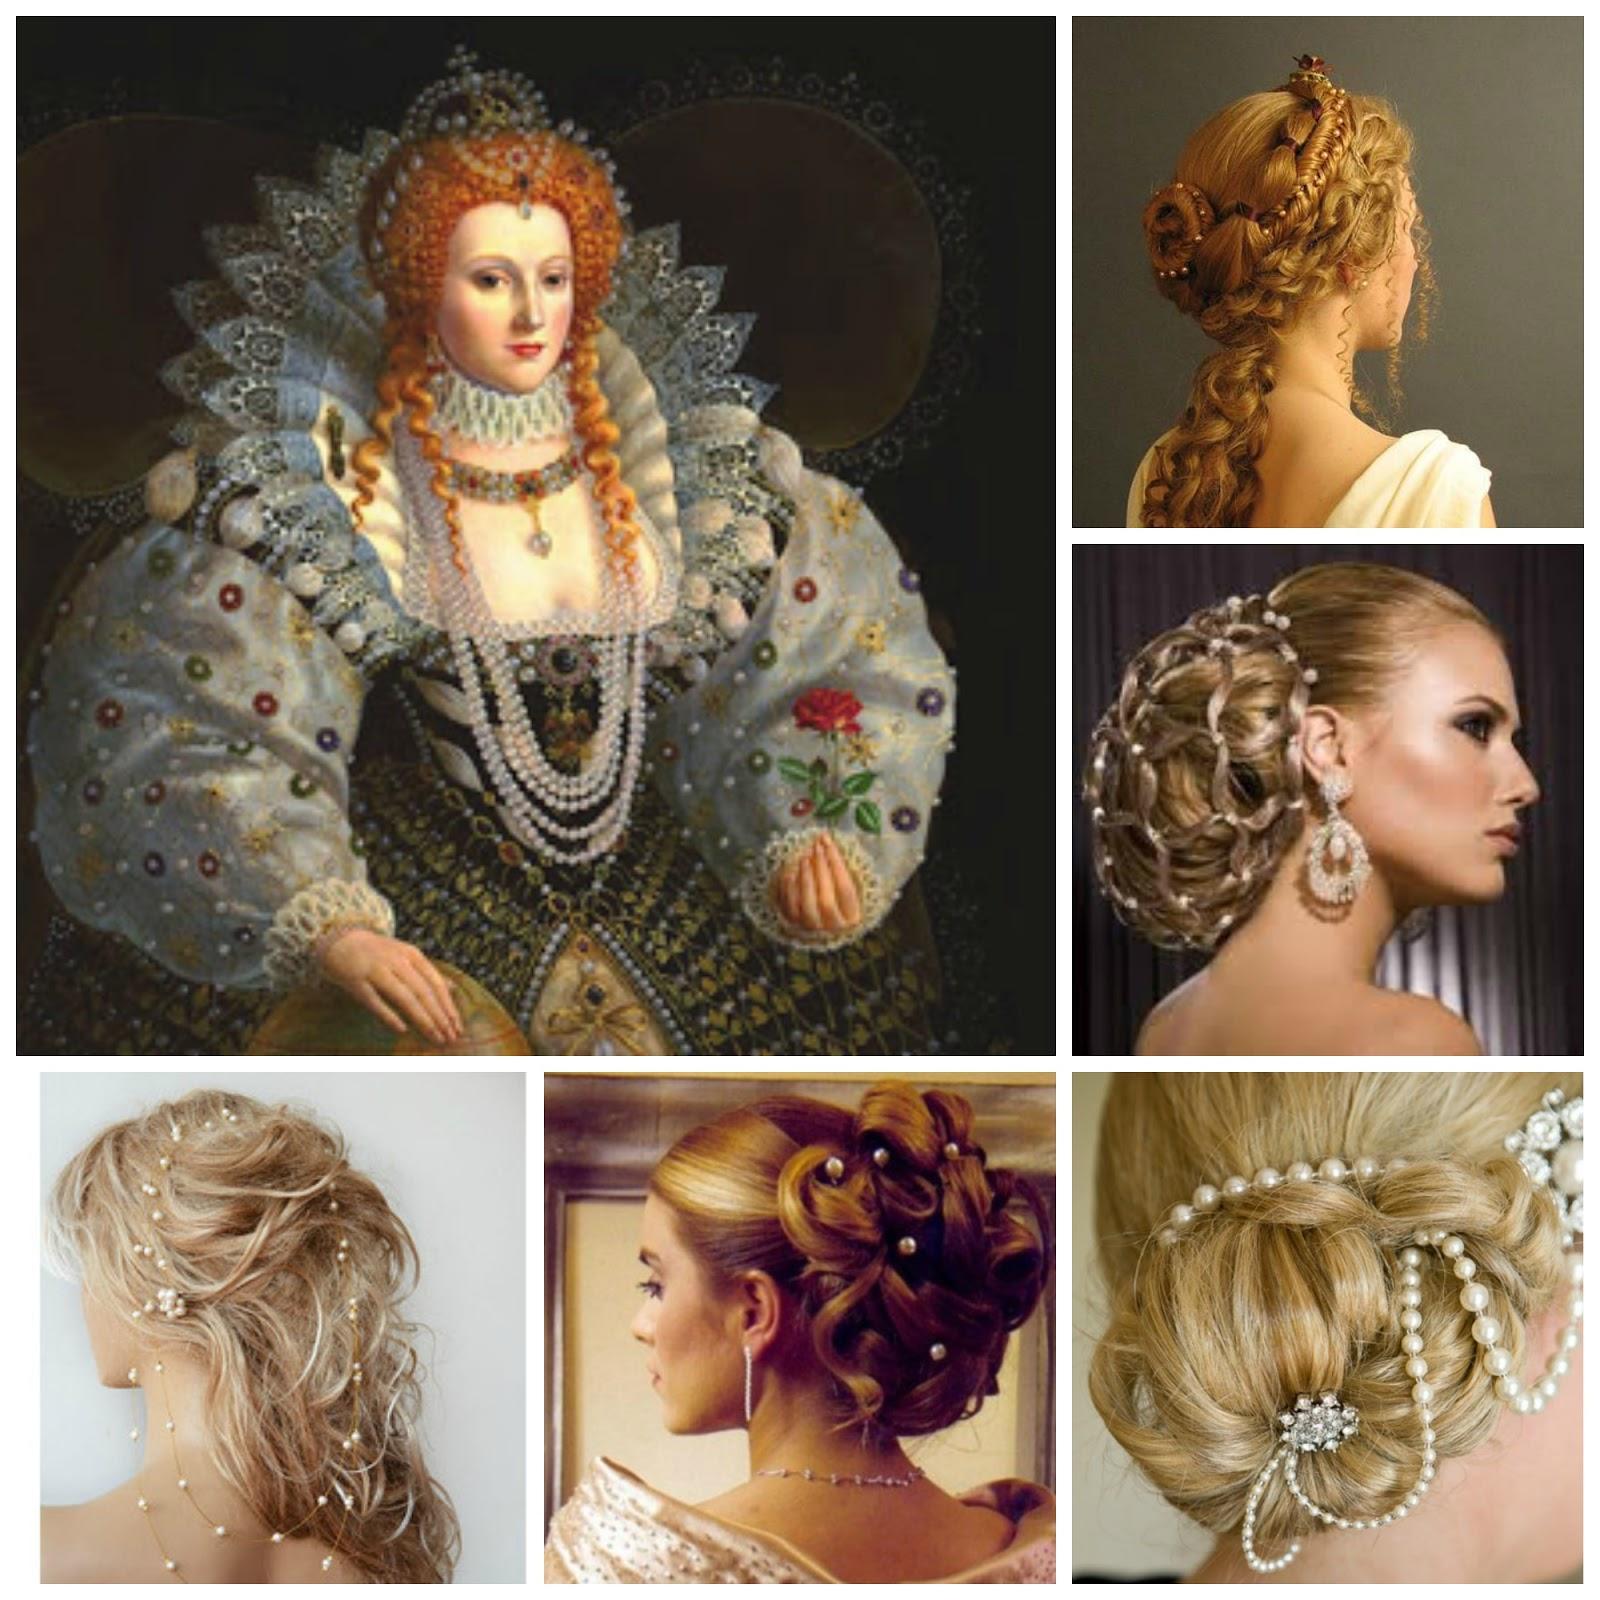 fms407staceyeredheadsandroyalty: hair inspiration; using